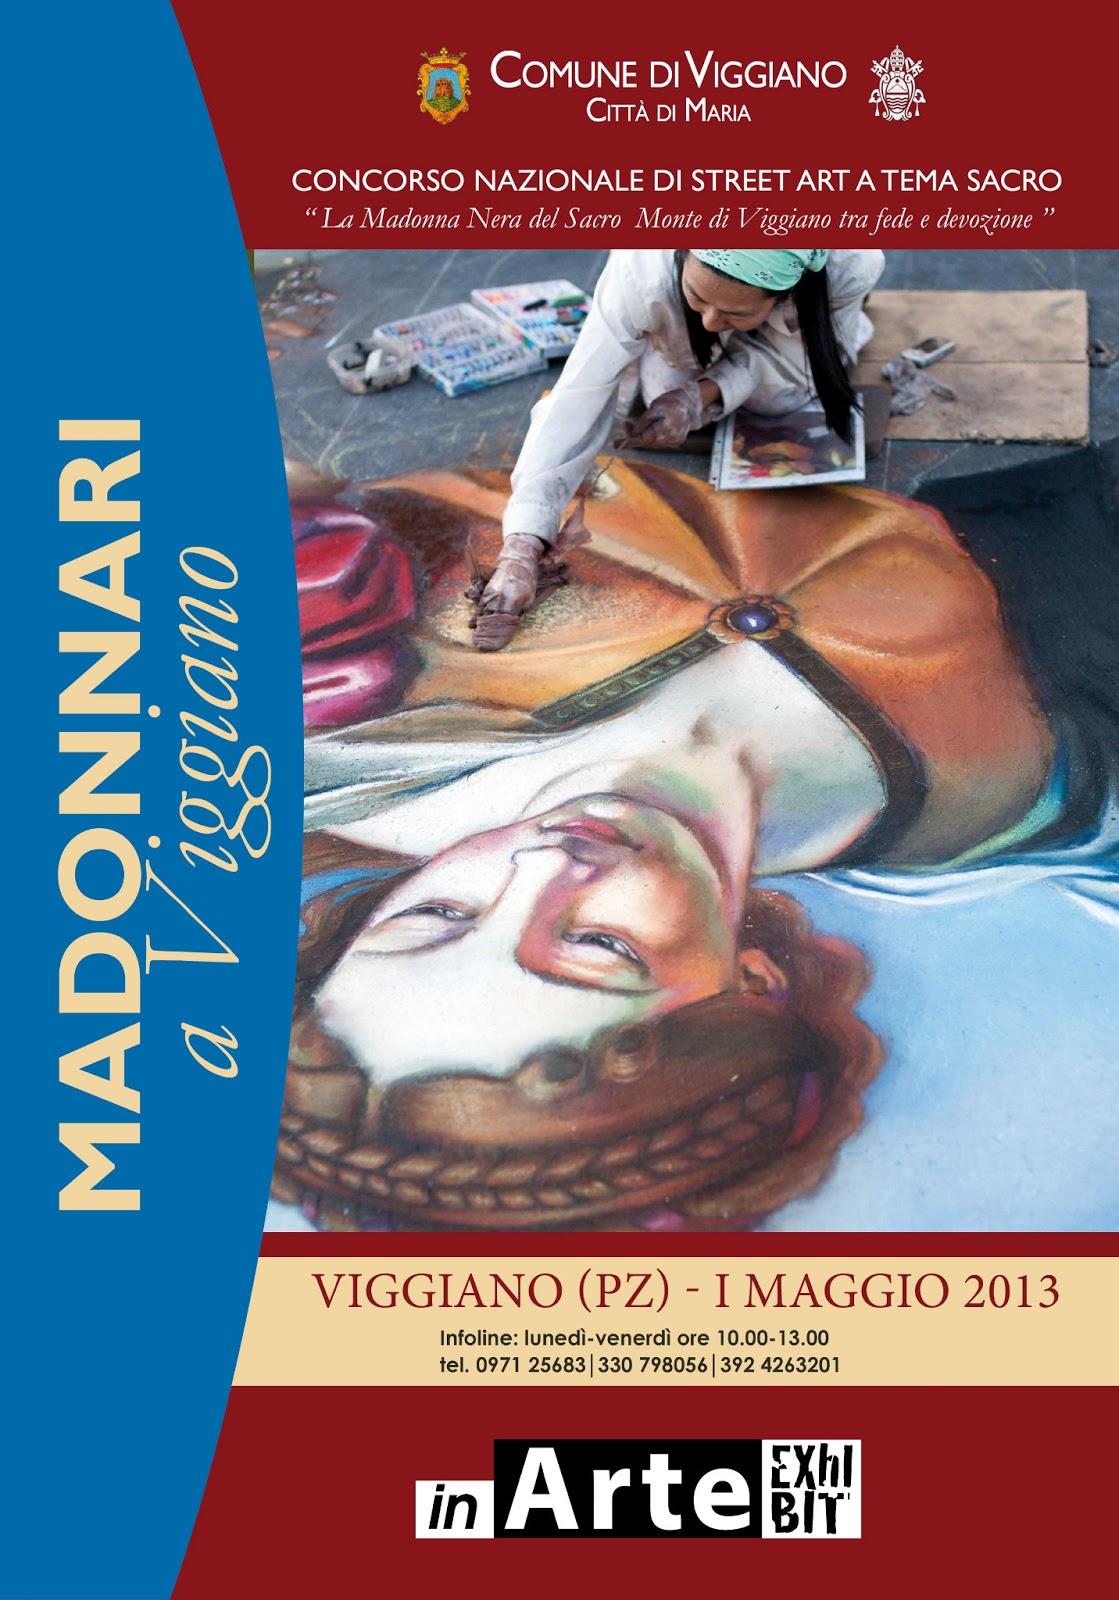 http://inarte-blog.blogspot.it/2013/04/madonnari-viggiano.html